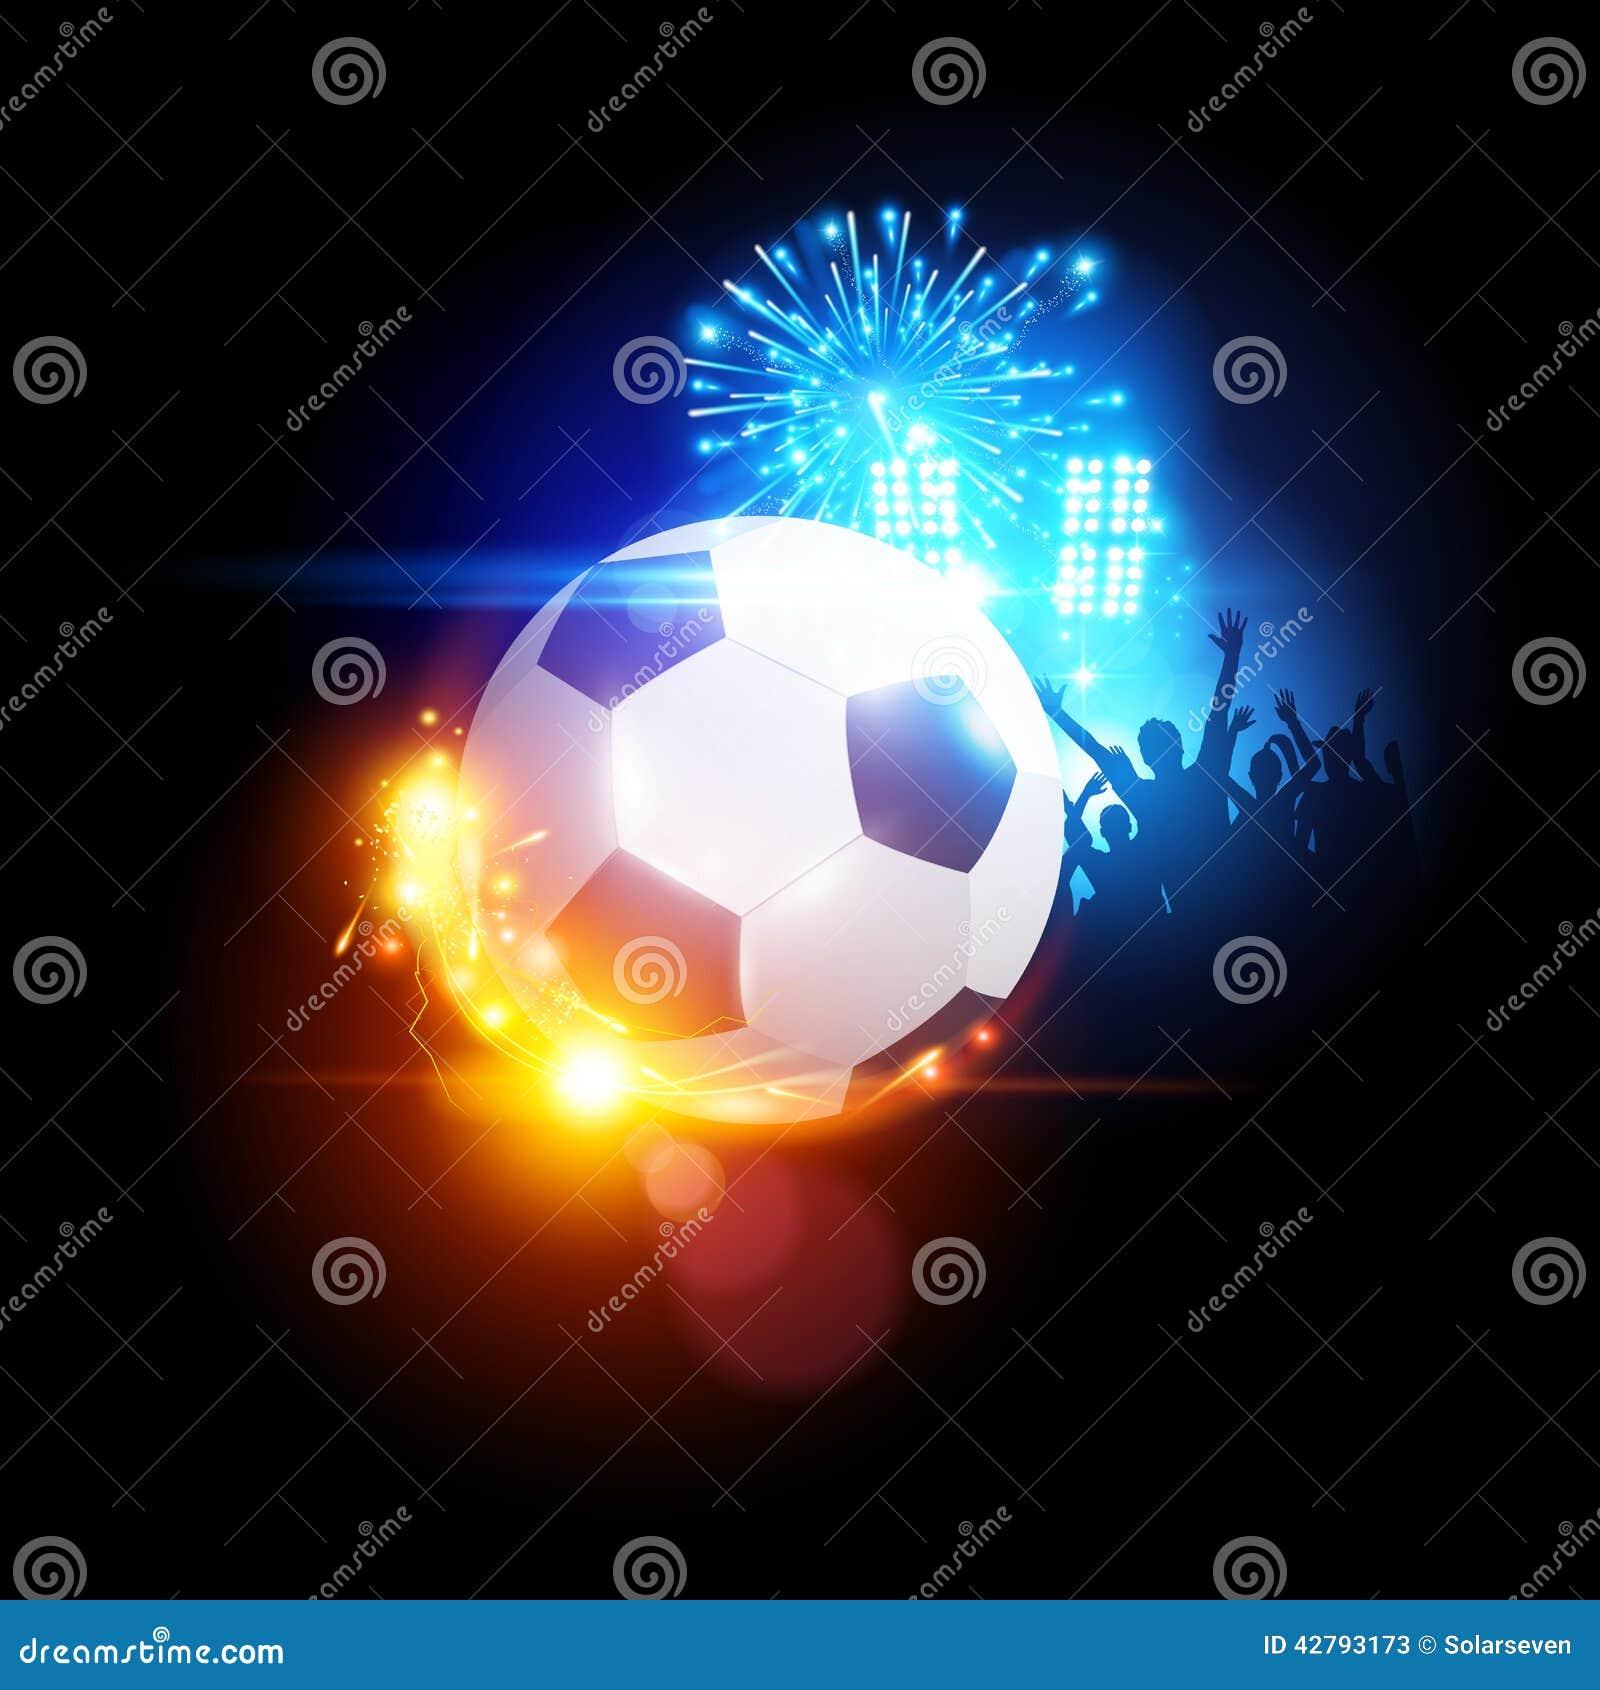 Stadium Lights Svg: Glowing Football Stock Vector